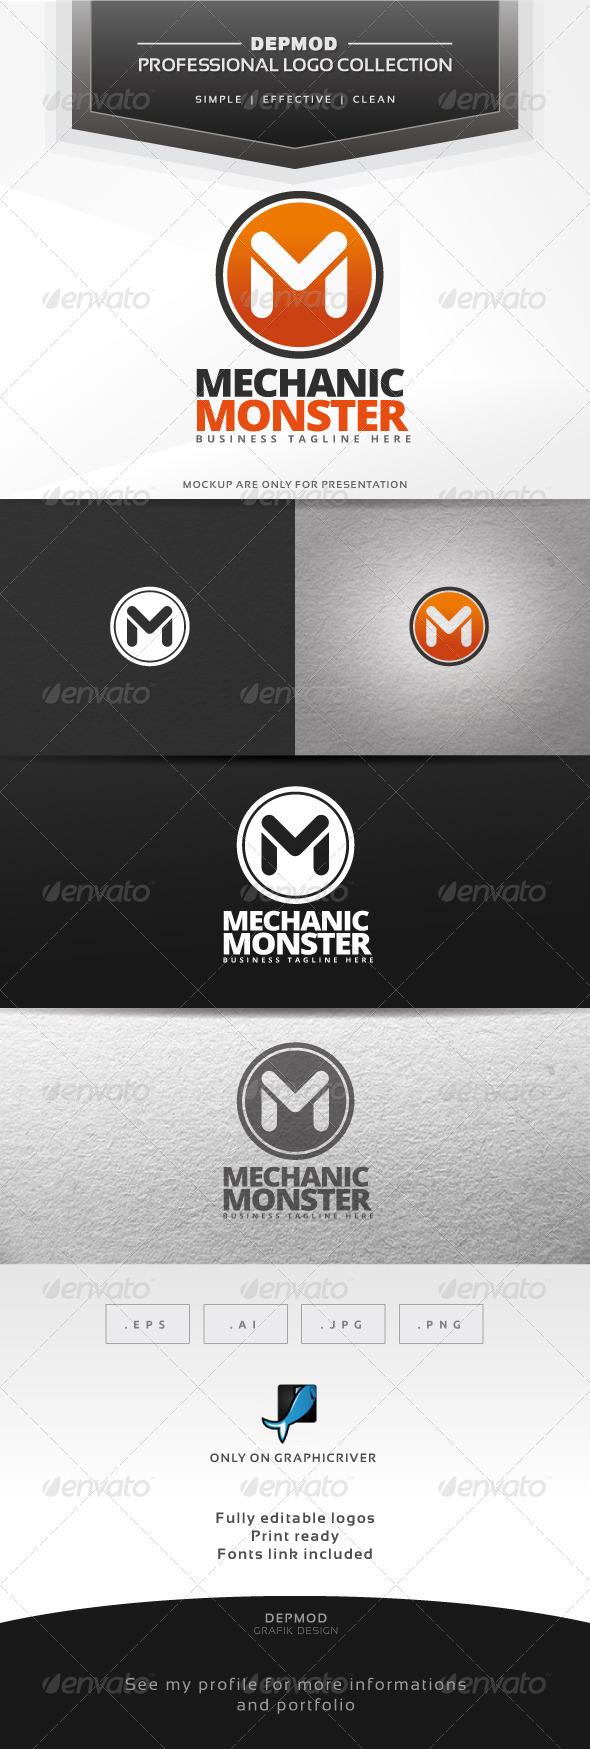 GraphicRiver Mechanic Monster Logo 6781873